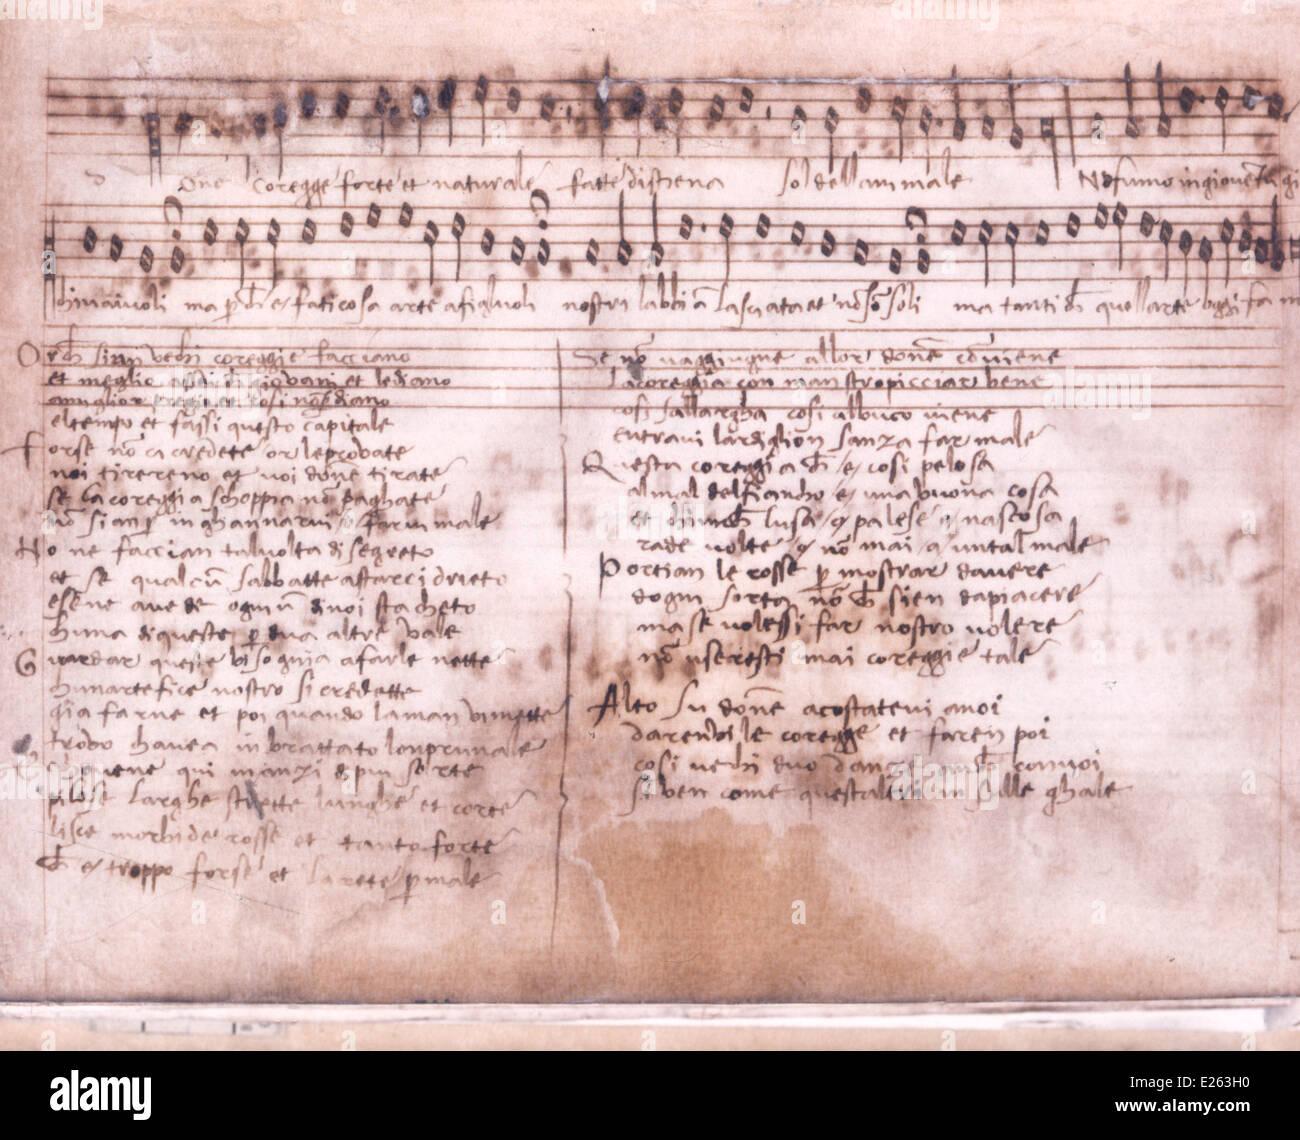 Musica historia,Página de música del siglo XVI,Conservatorio Santa Cecilia,Roma Imagen De Stock